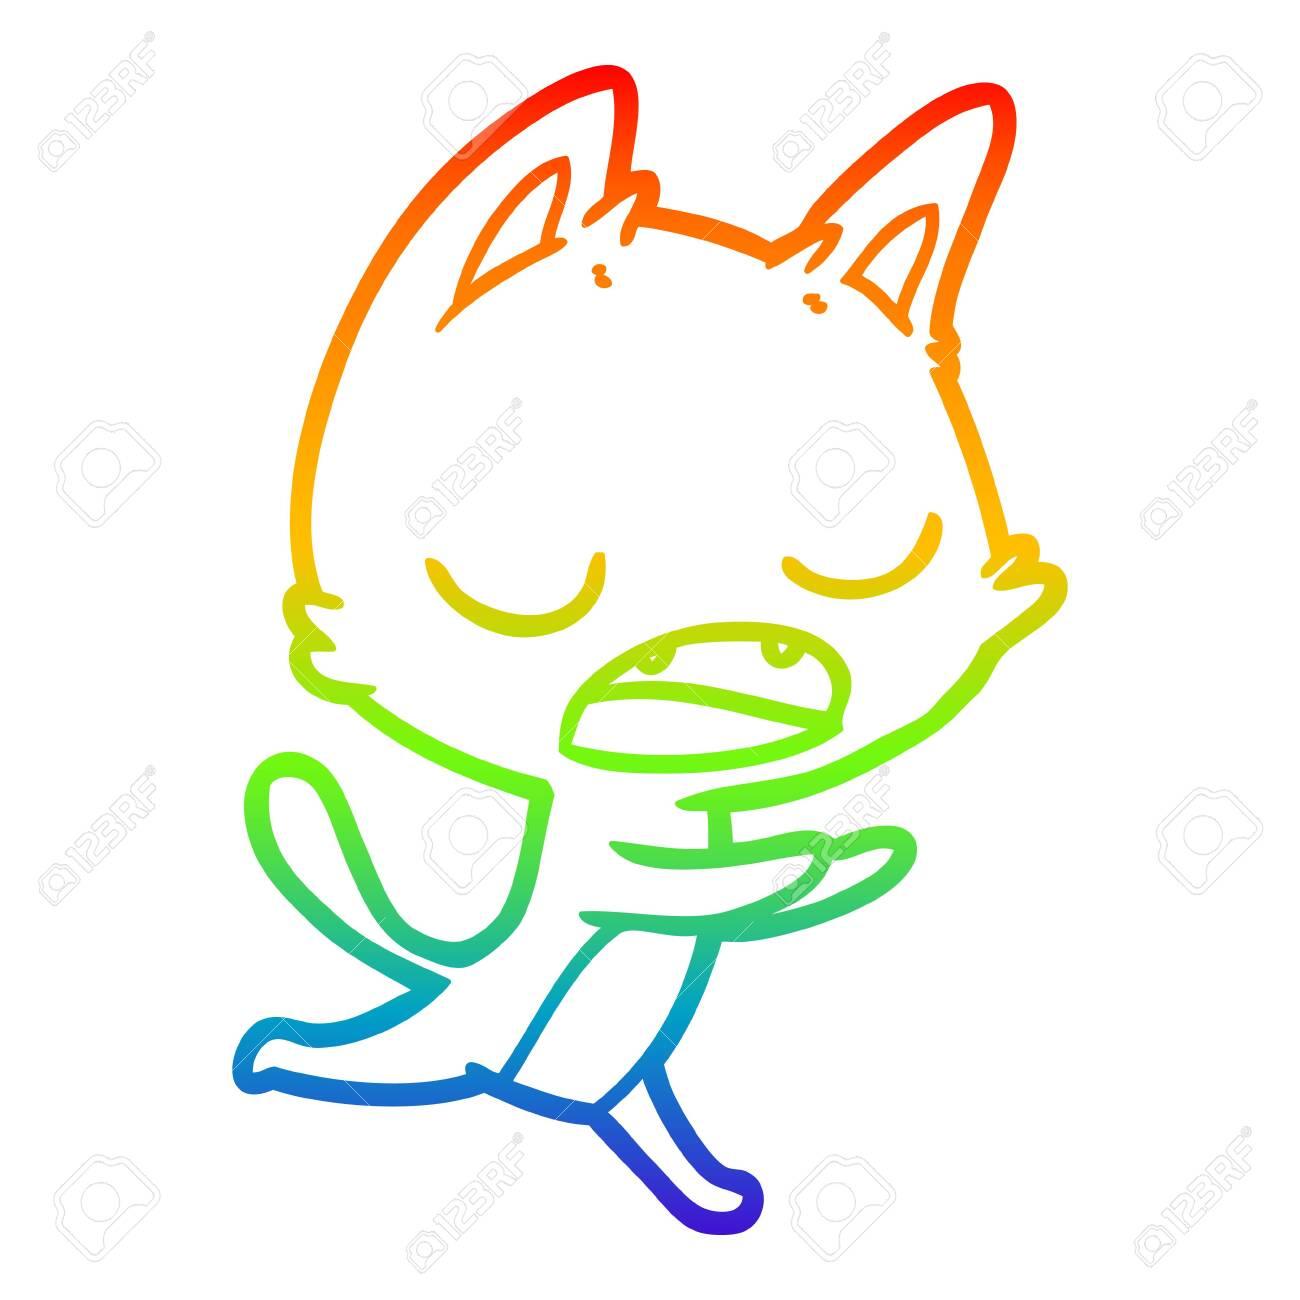 rainbow gradient line drawing of a talking cat cartoon - 130604106